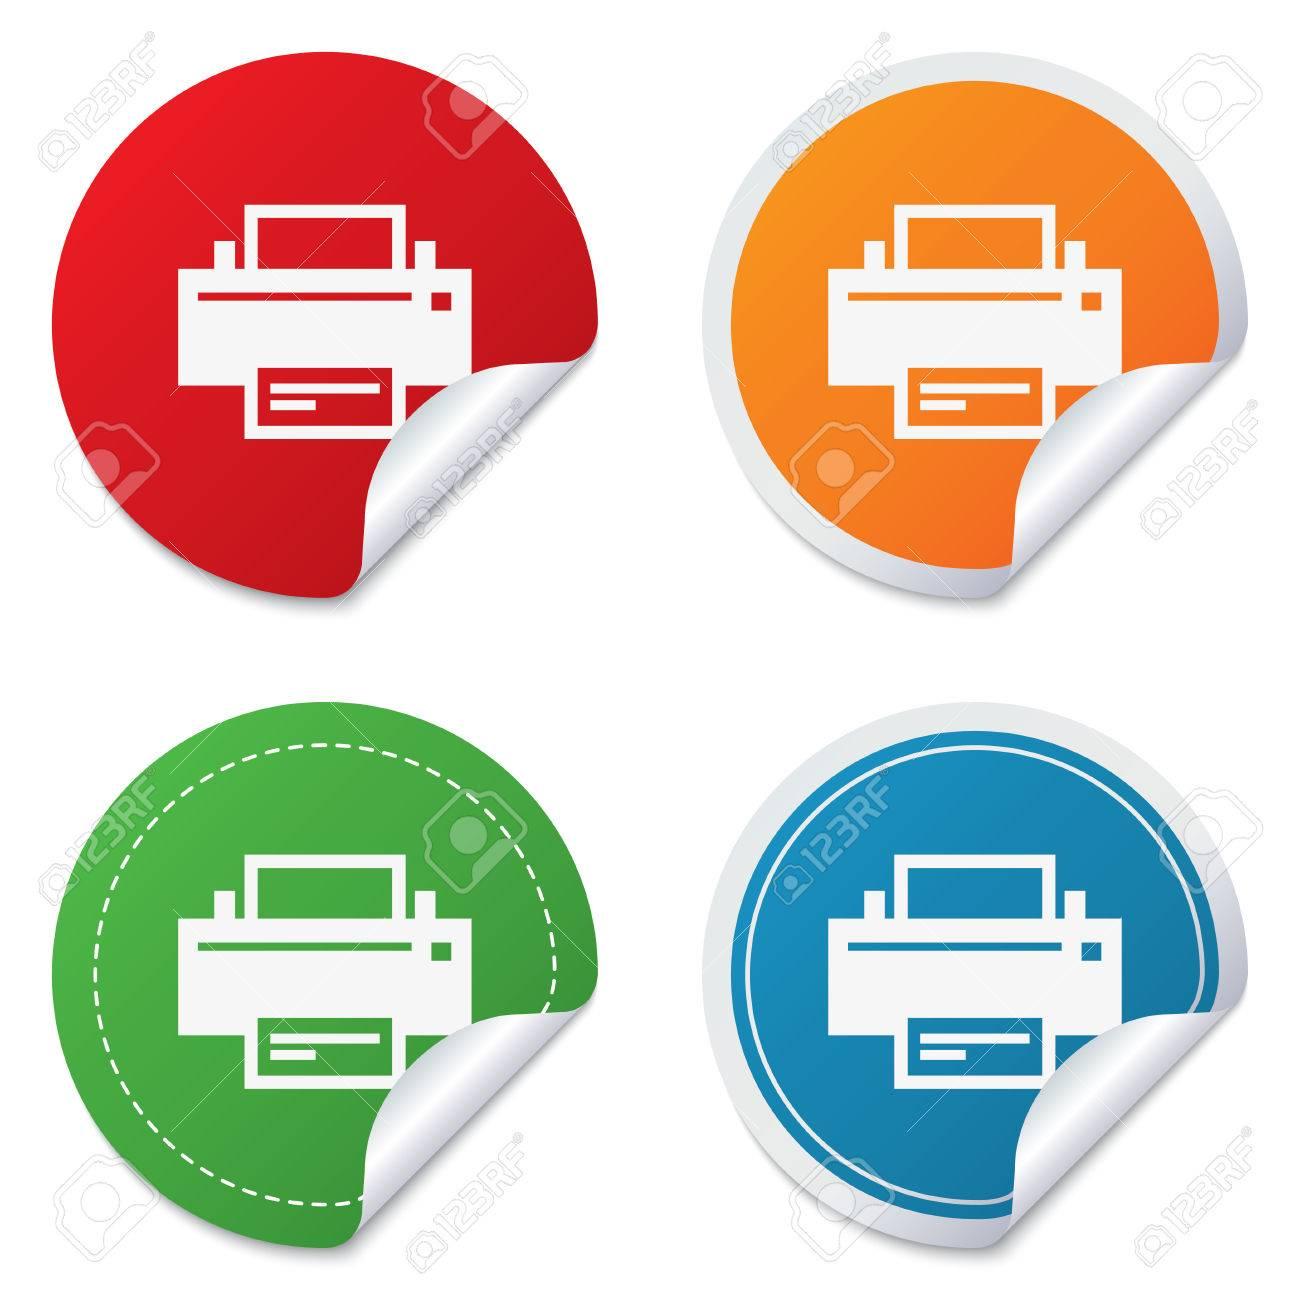 image regarding Round Stickers Printable identified as Print indicator icon. Printing logo. Print upon. Spherical stickers